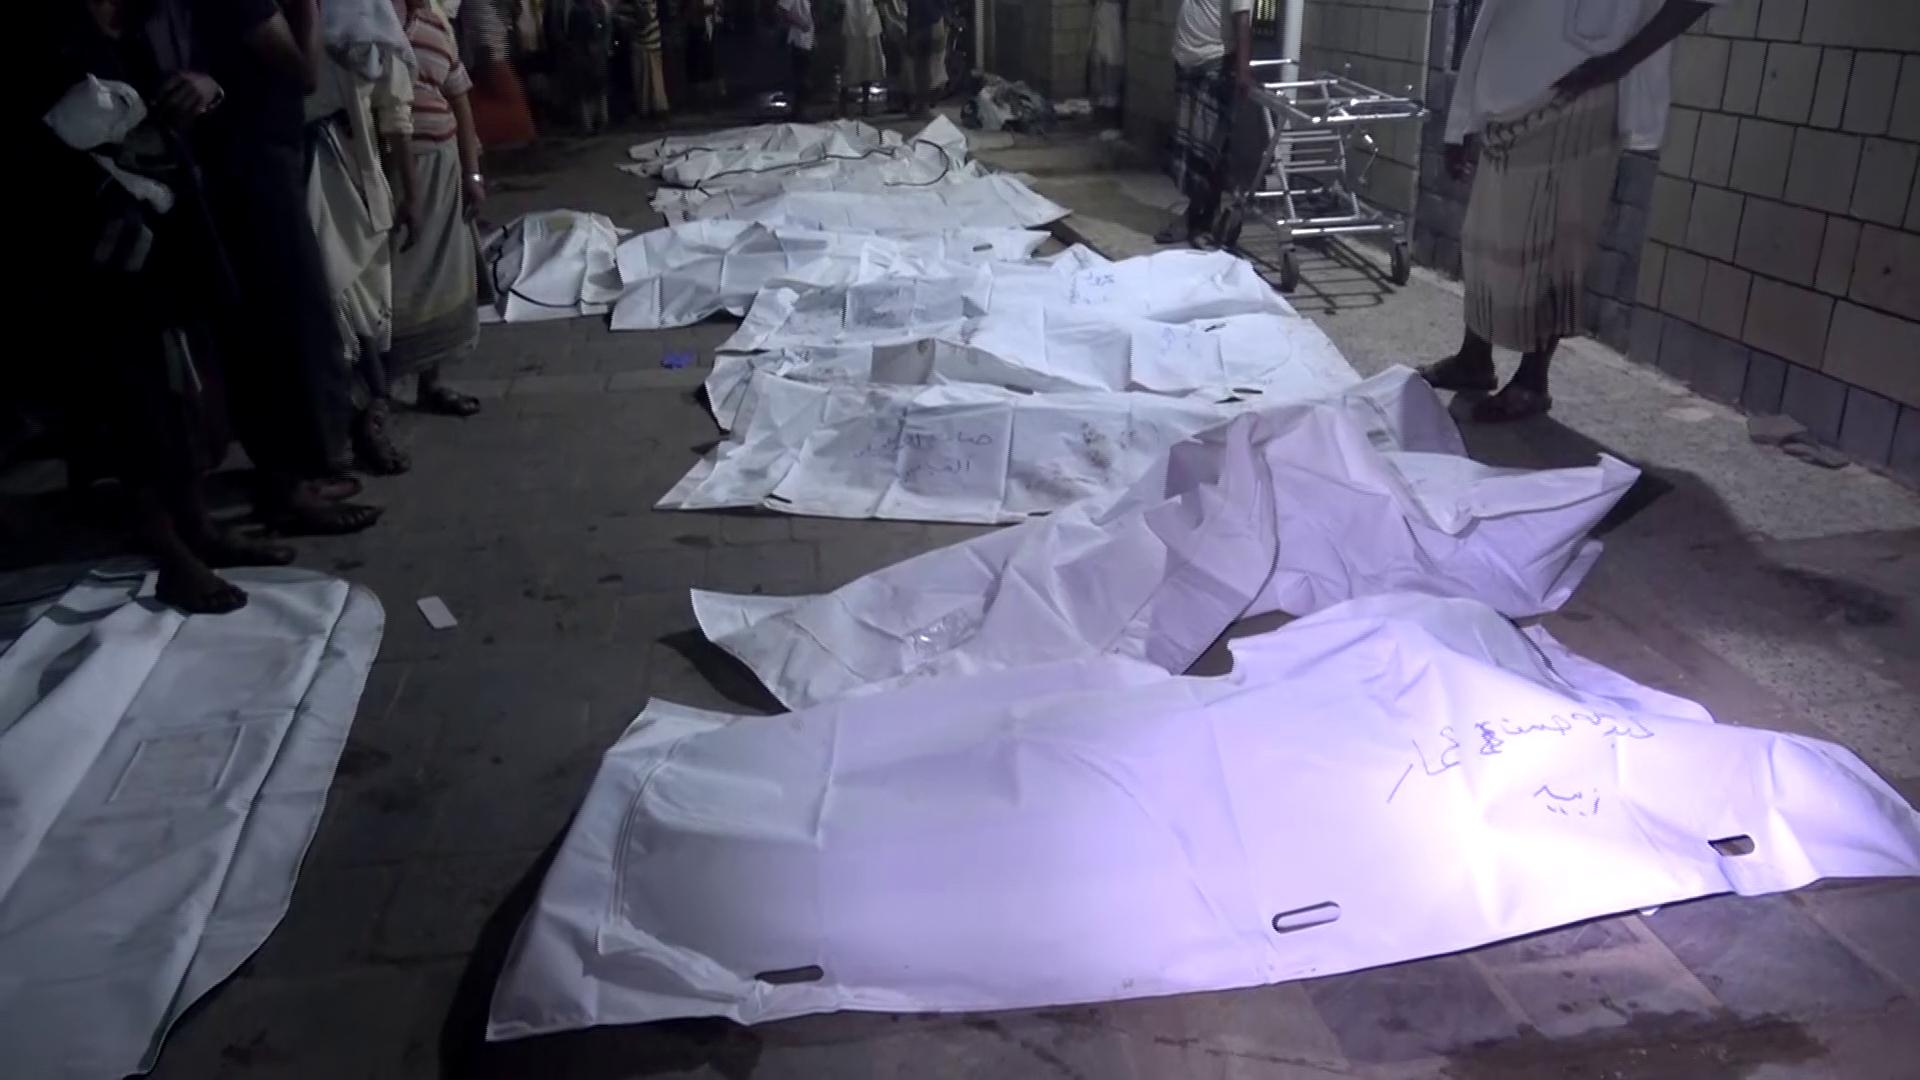 Low-Profile Killing: Unlike Khashoggi Case, New Saudi Slaughter in Yemen Evokes Little Concern